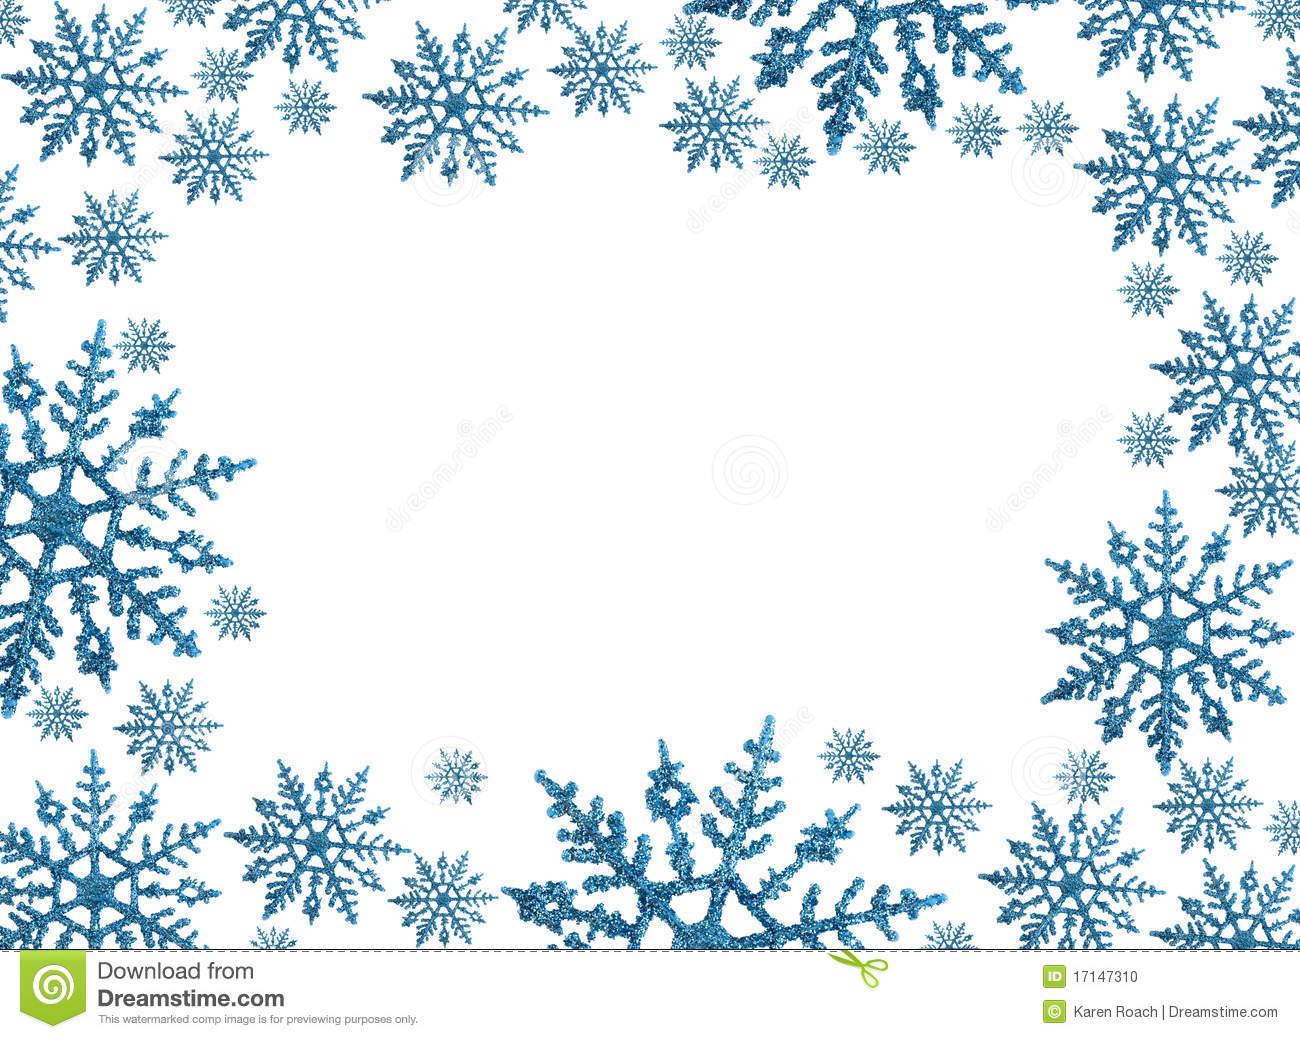 Snowflake Frame Clipart-Snowflake Frame Clipart-11